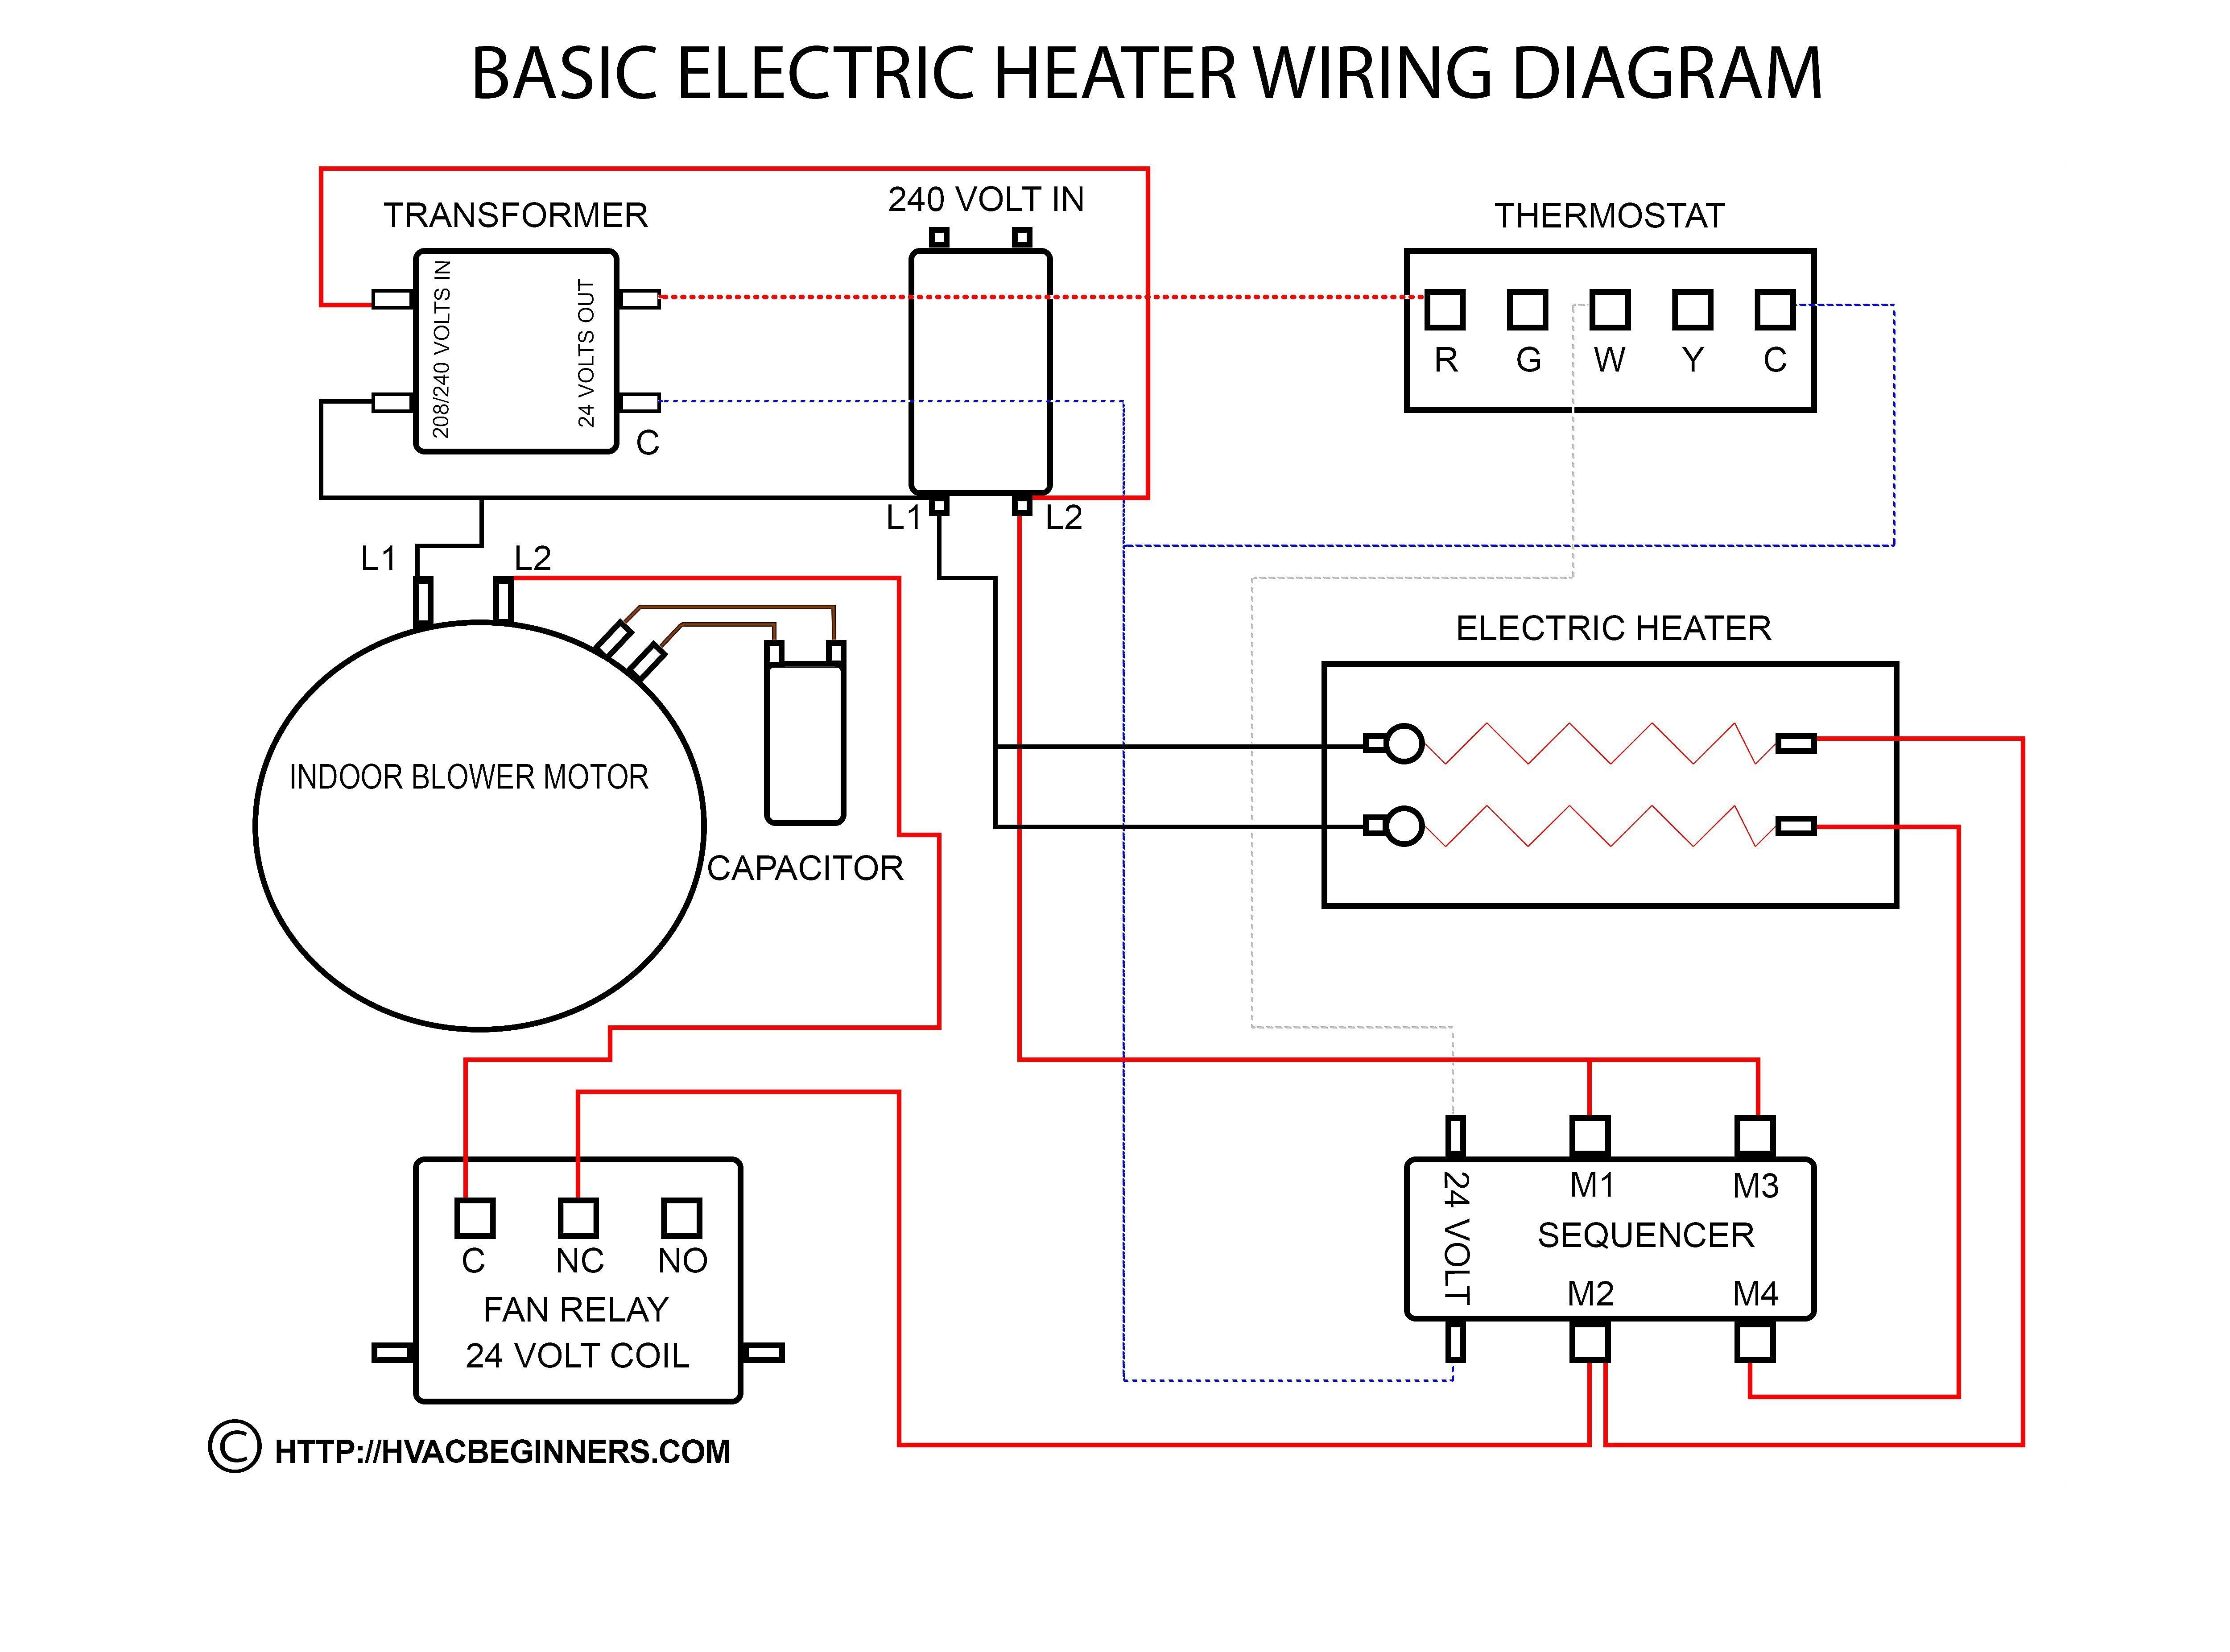 Wiring Diagram Trailer Save Wiring Diagram for Trailer Valid Http Wikidiyfaqorguk 0 0d